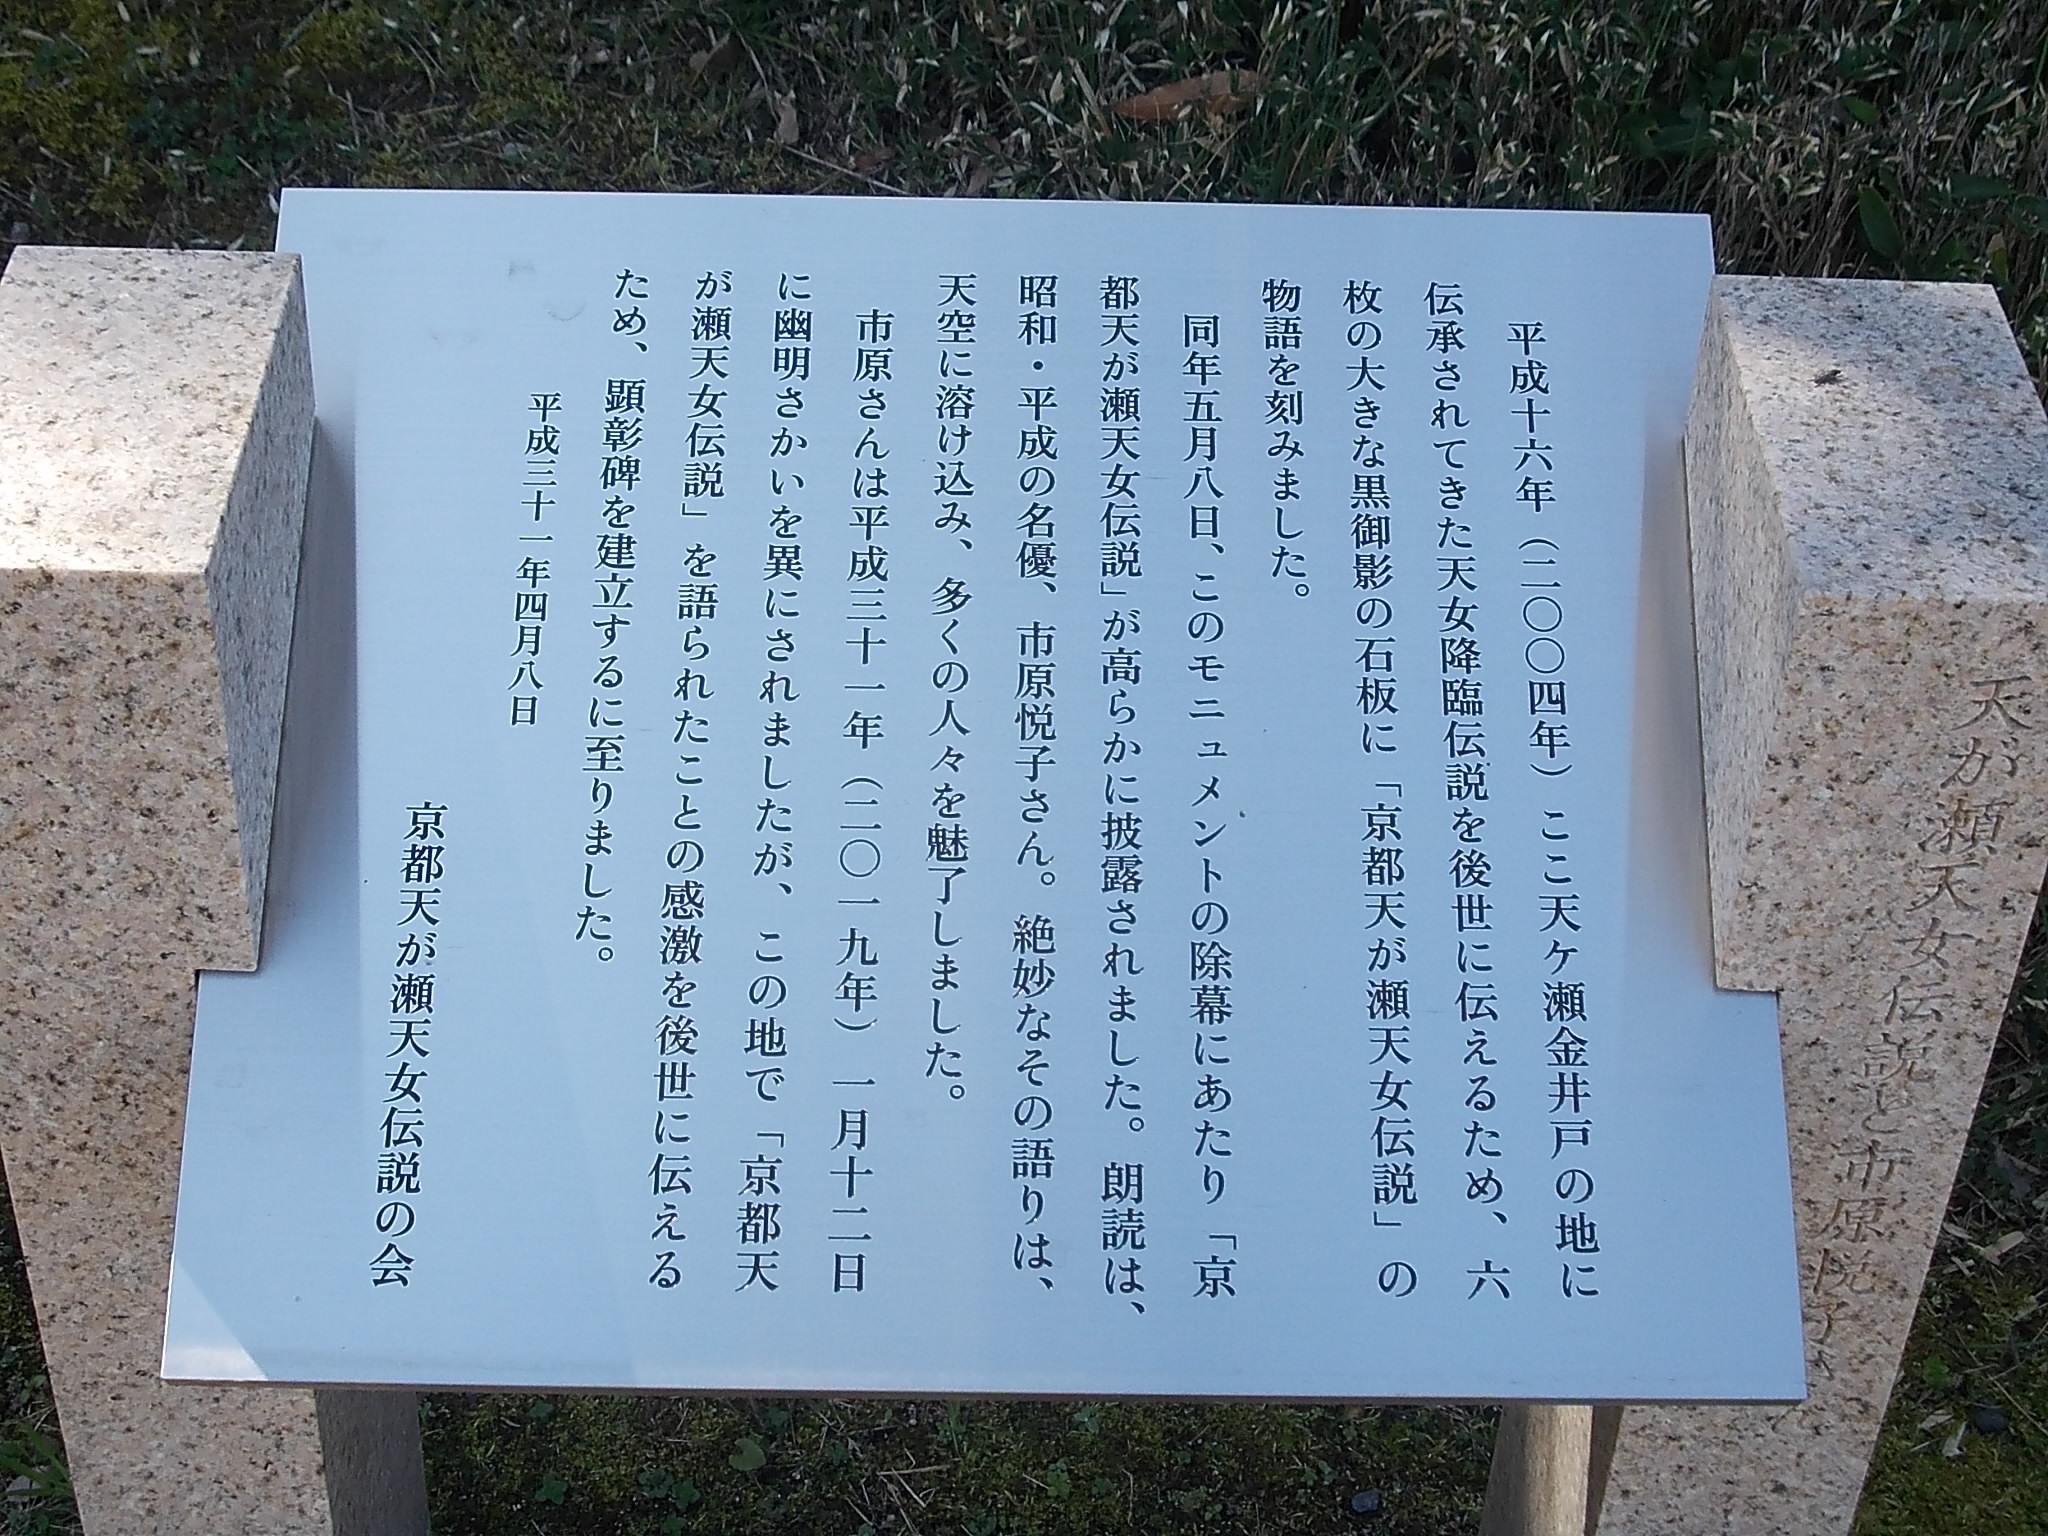 故・市原悦子様の顕彰碑